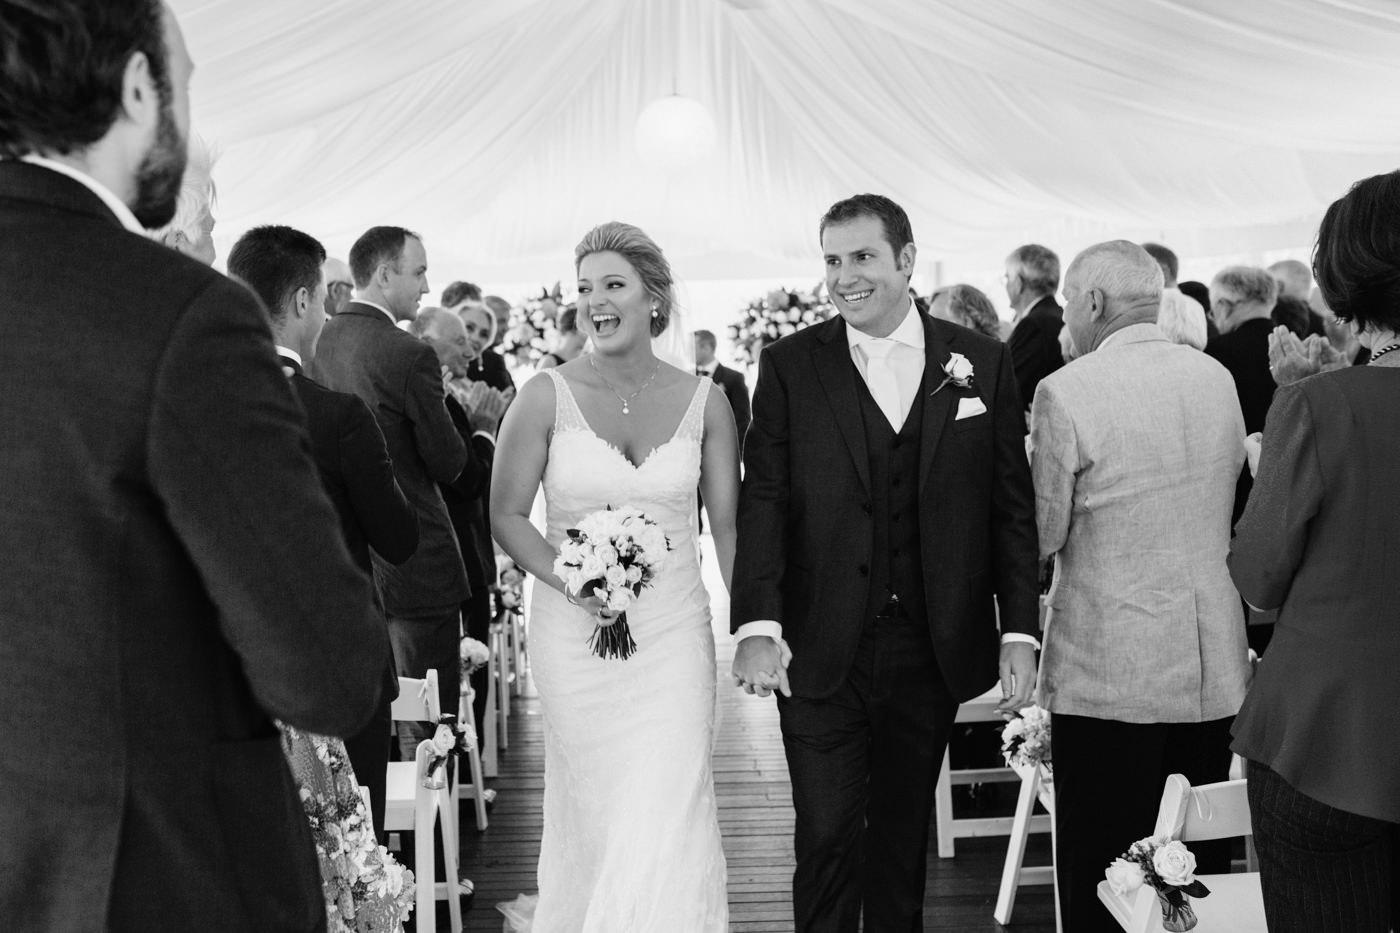 bracu_wedding_photos1041.jpg